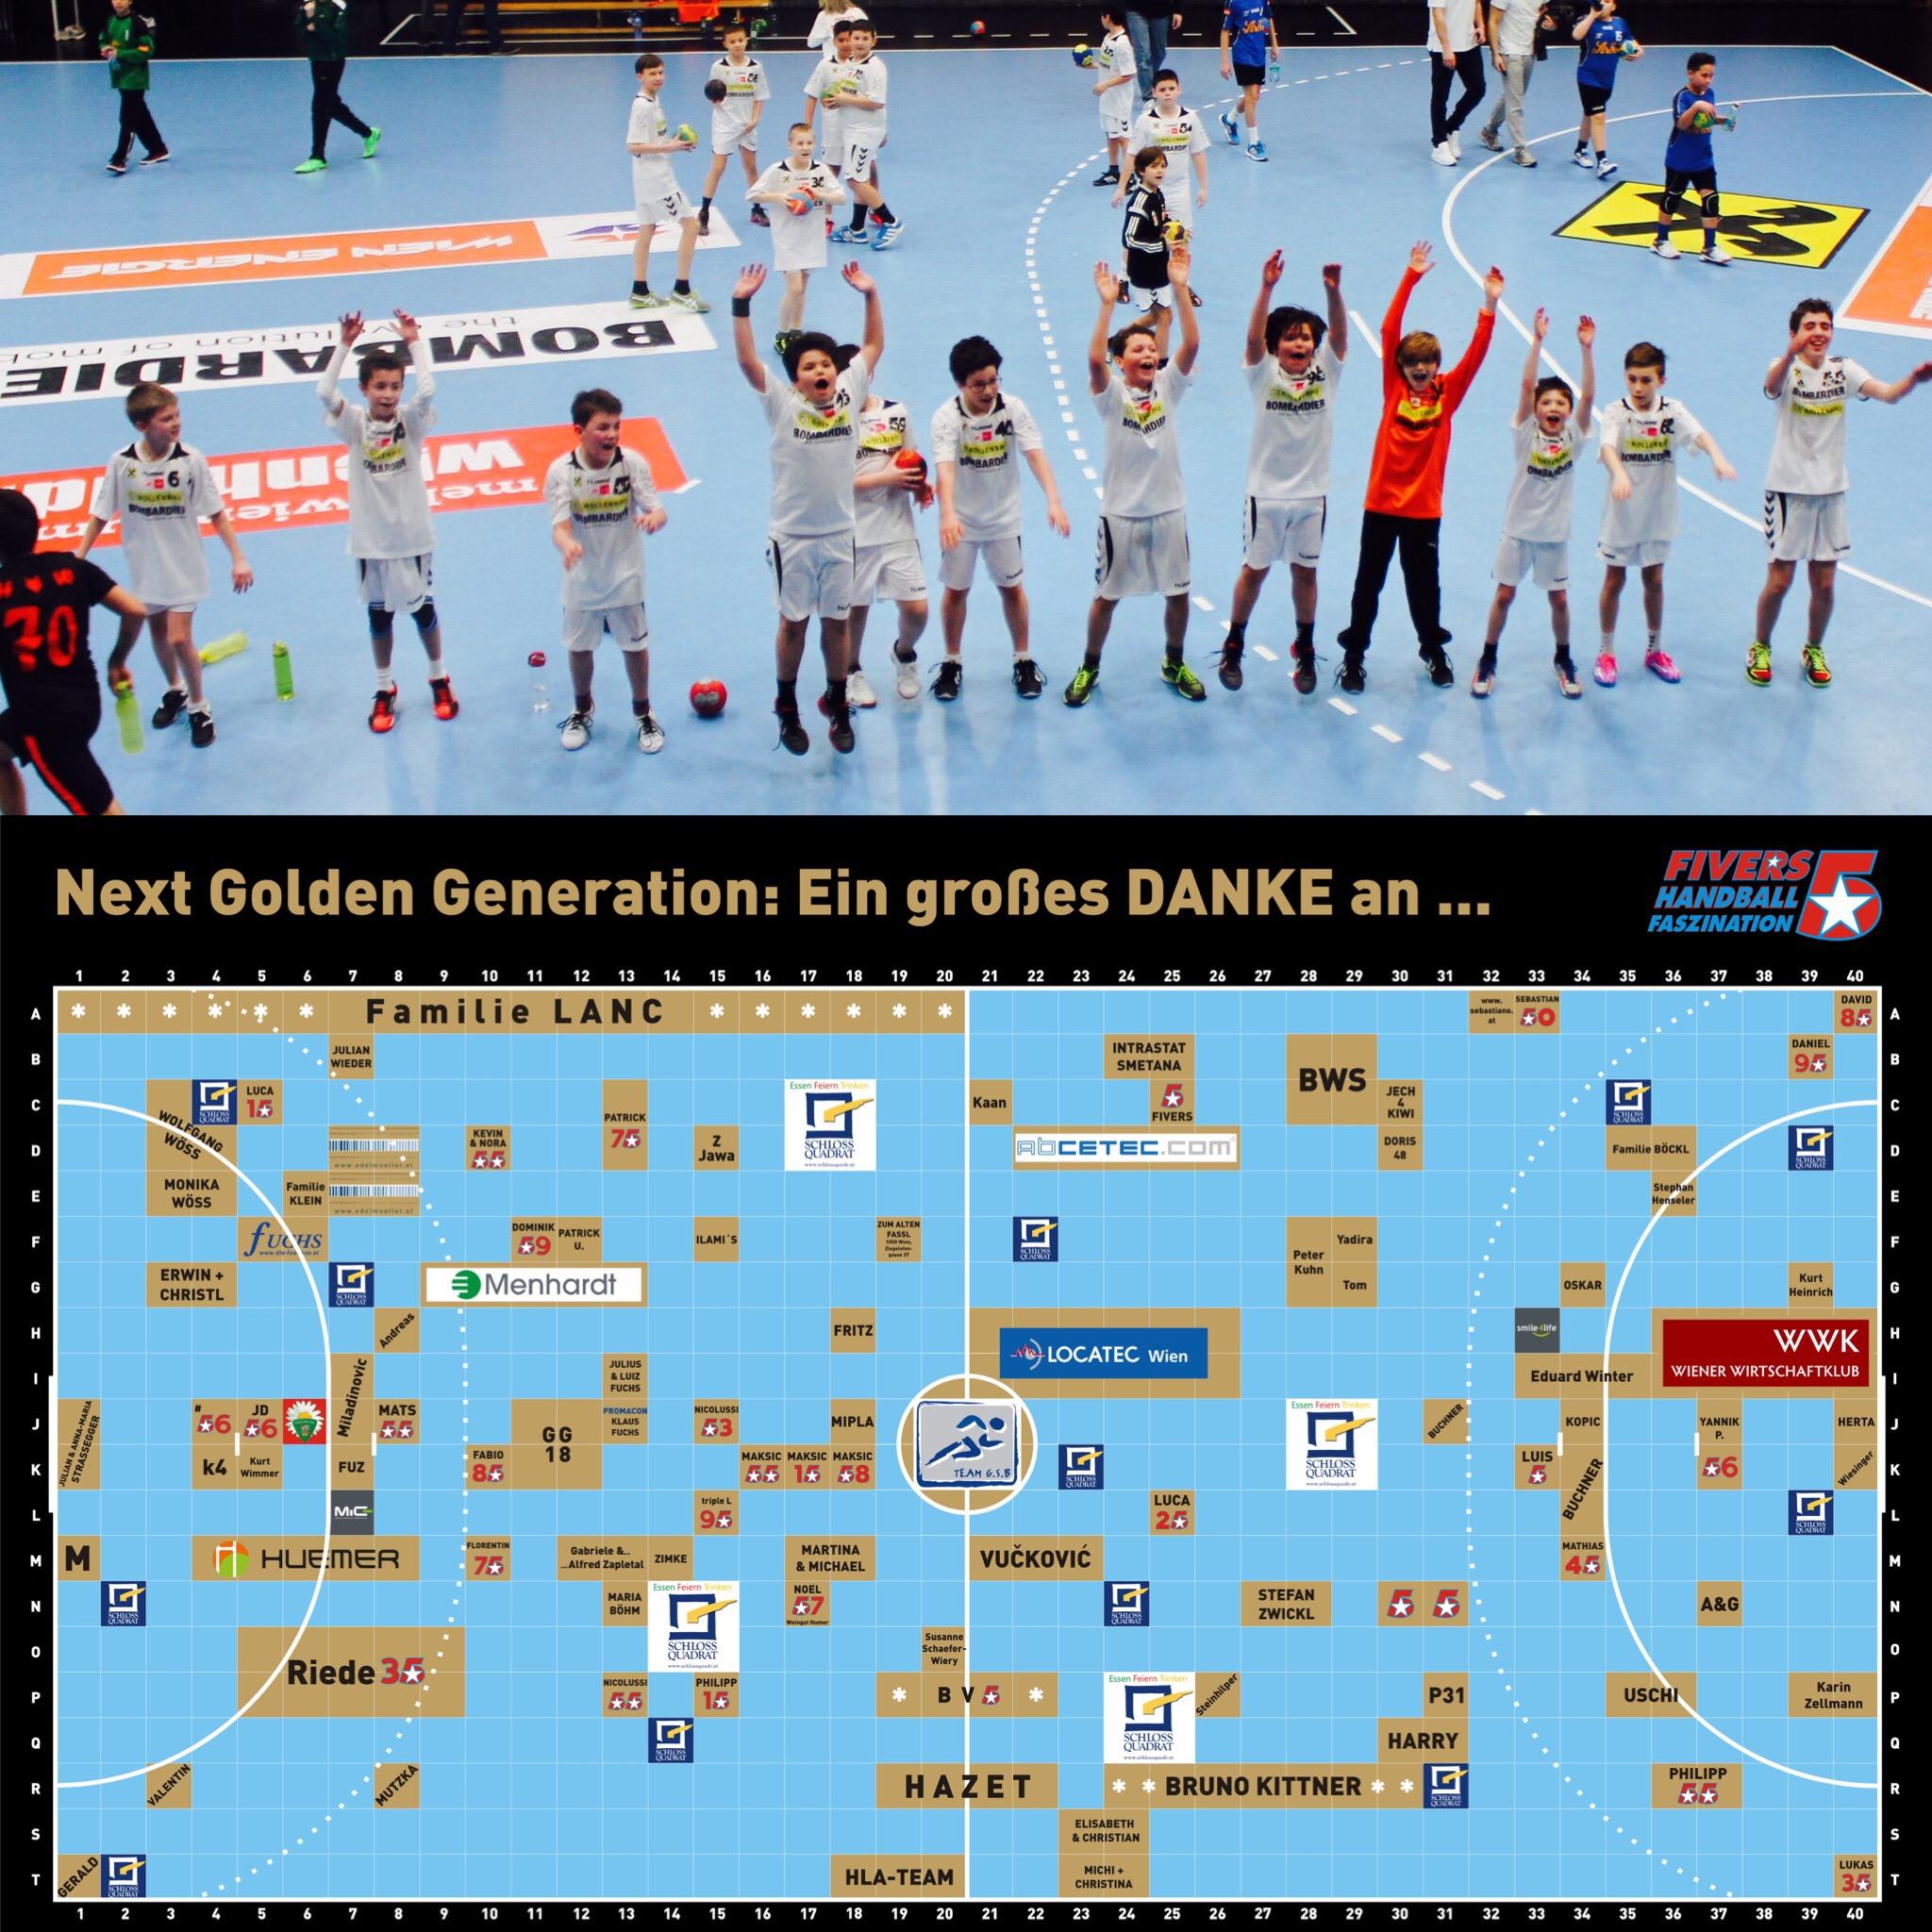 U11-2_NEXT GOLDEN GENERATION_Saison 2015-16